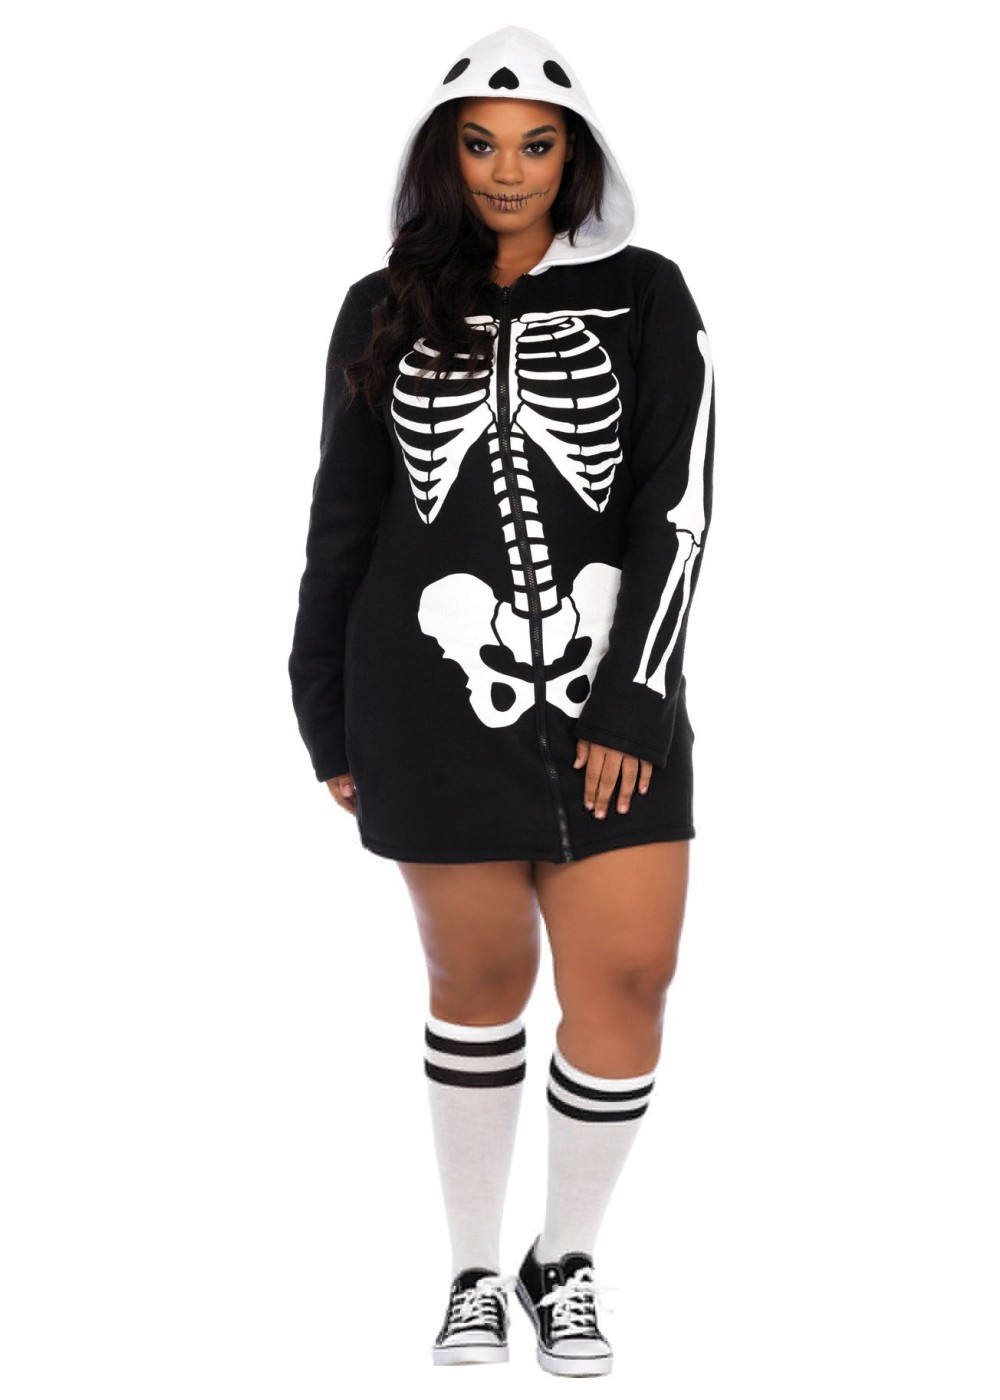 Plus Size Women Skeleton Hoodie Dress Sexy Costumes